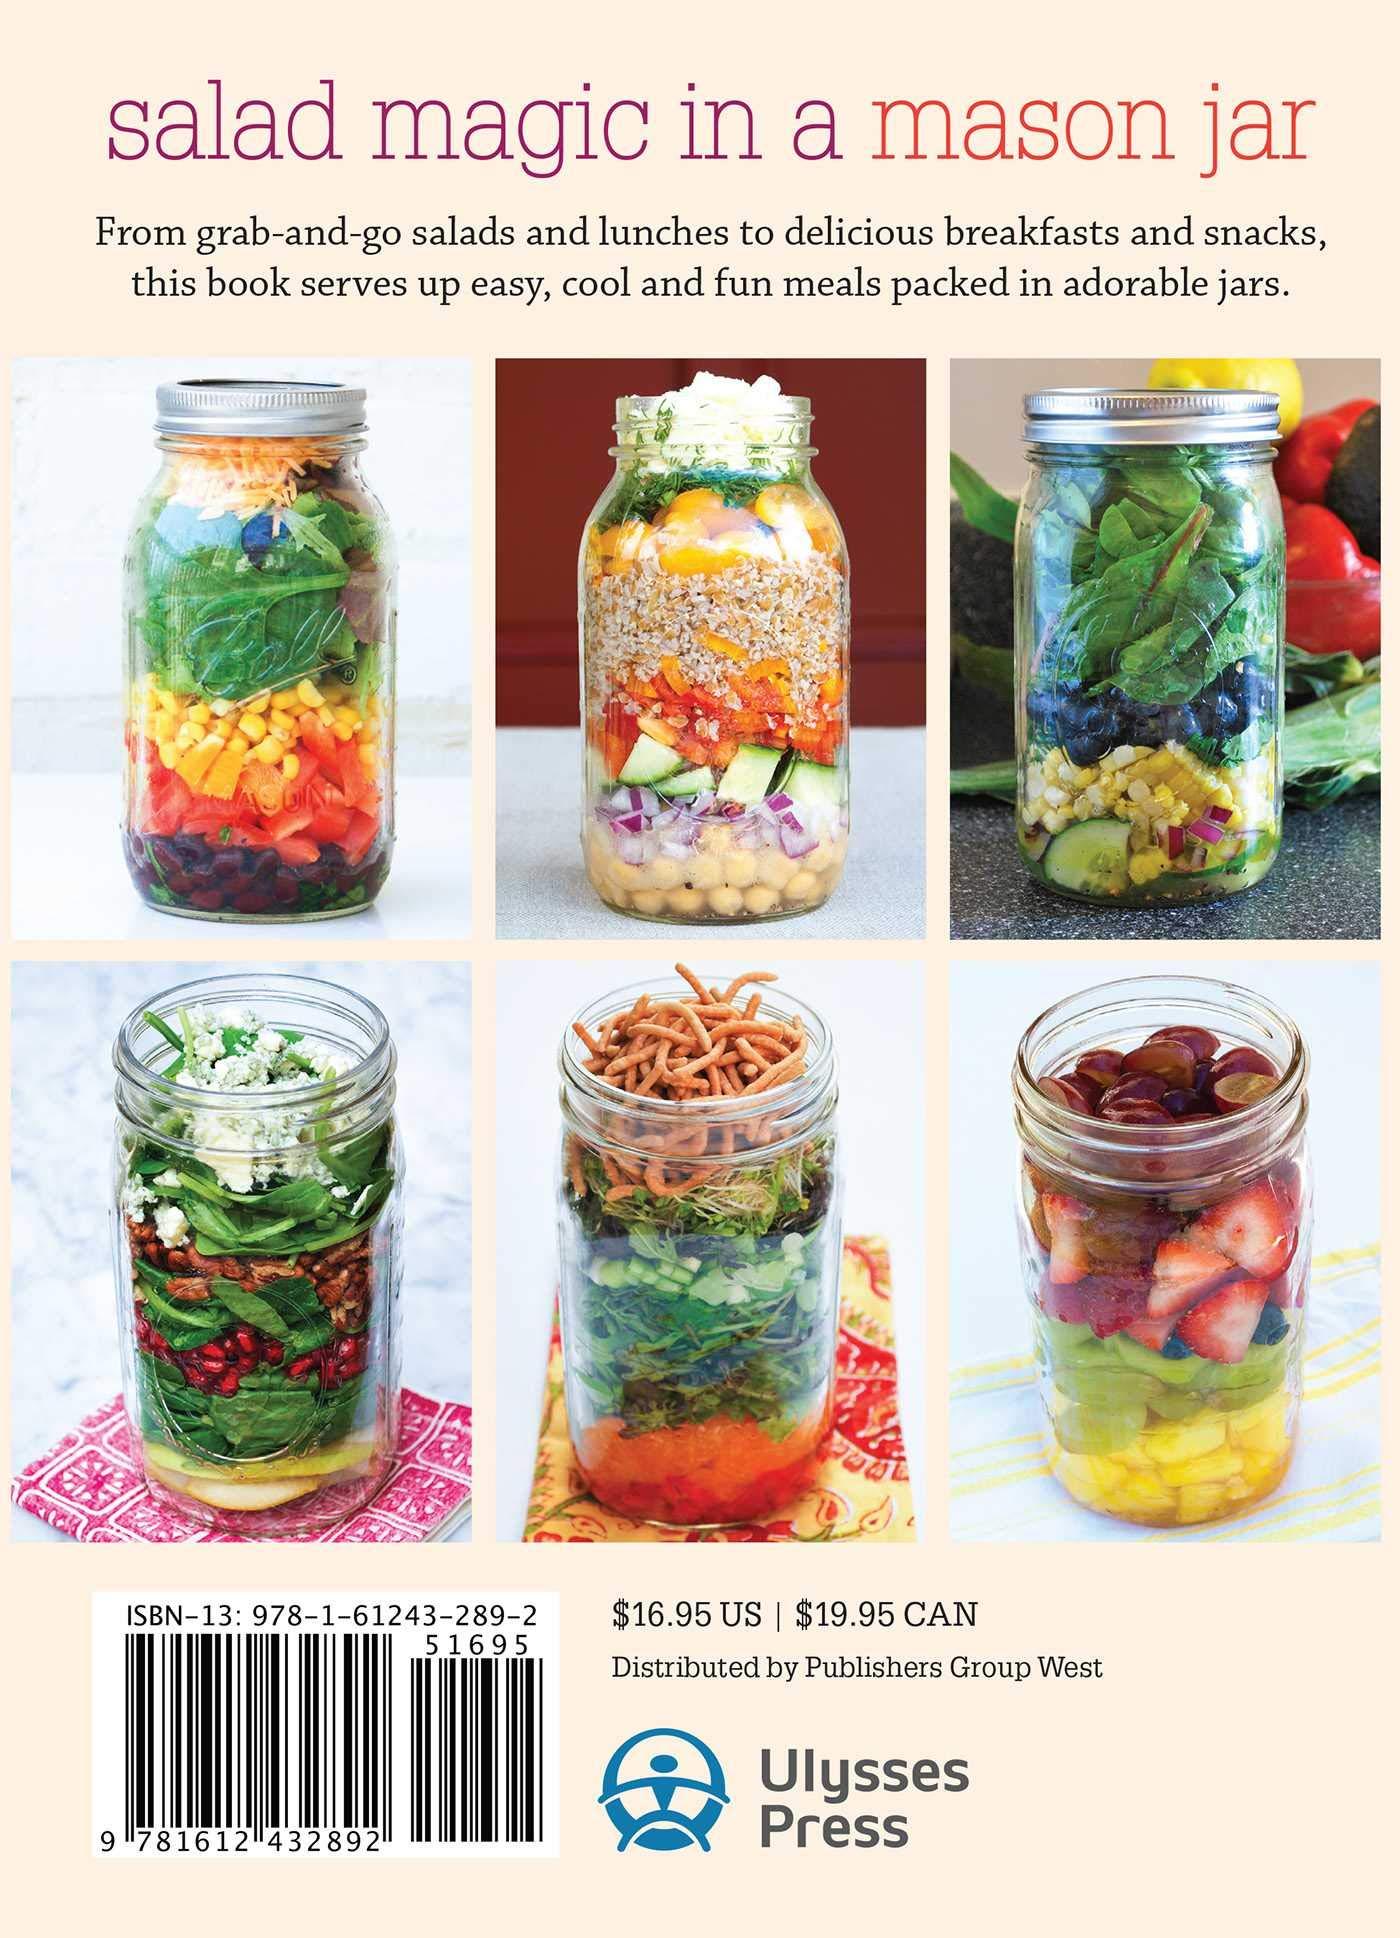 Mason Jar Salads And More 50 Layered Lunches To Grab And Go Mirabella Julia 0884640862583 Amazon Com Books